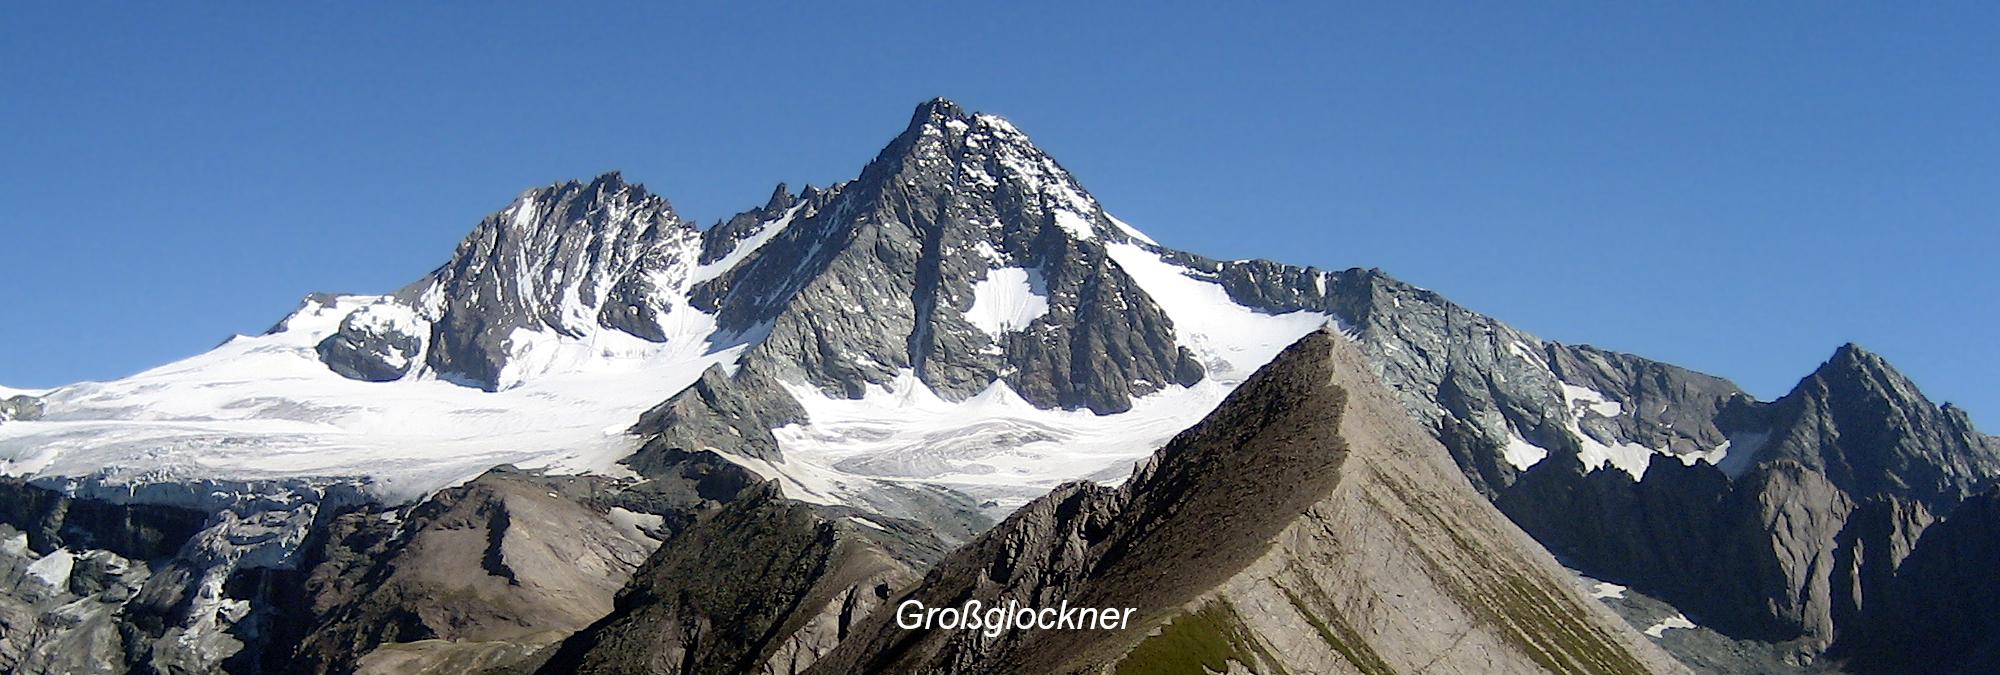 grossglockner1-text7A837A86-79E9-AA23-4AC6-0E92CD3E7FFB.jpg